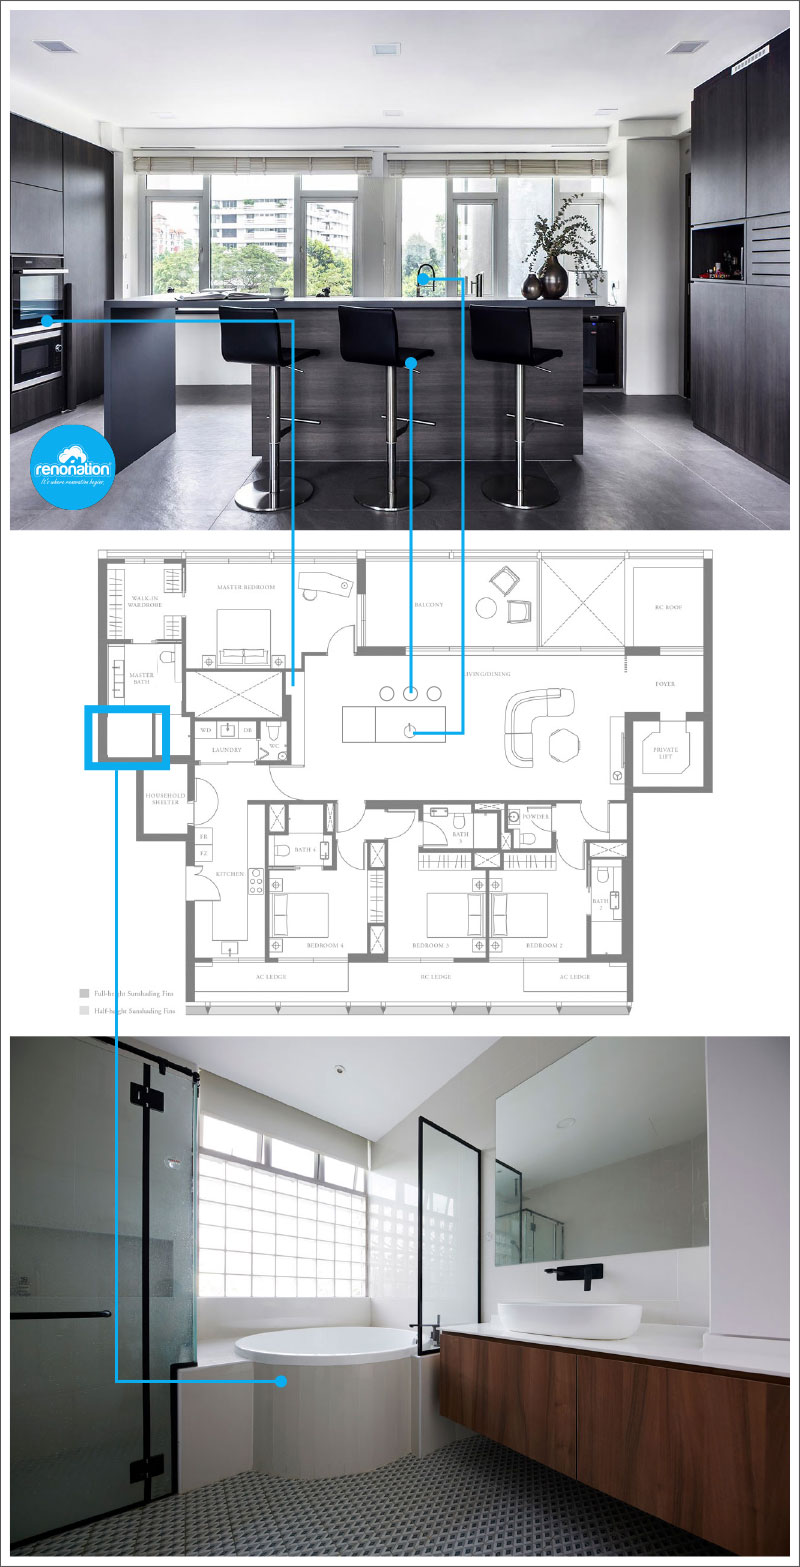 MEYERHOUSE - Designs: DistinctIdentity and The Interior Lab